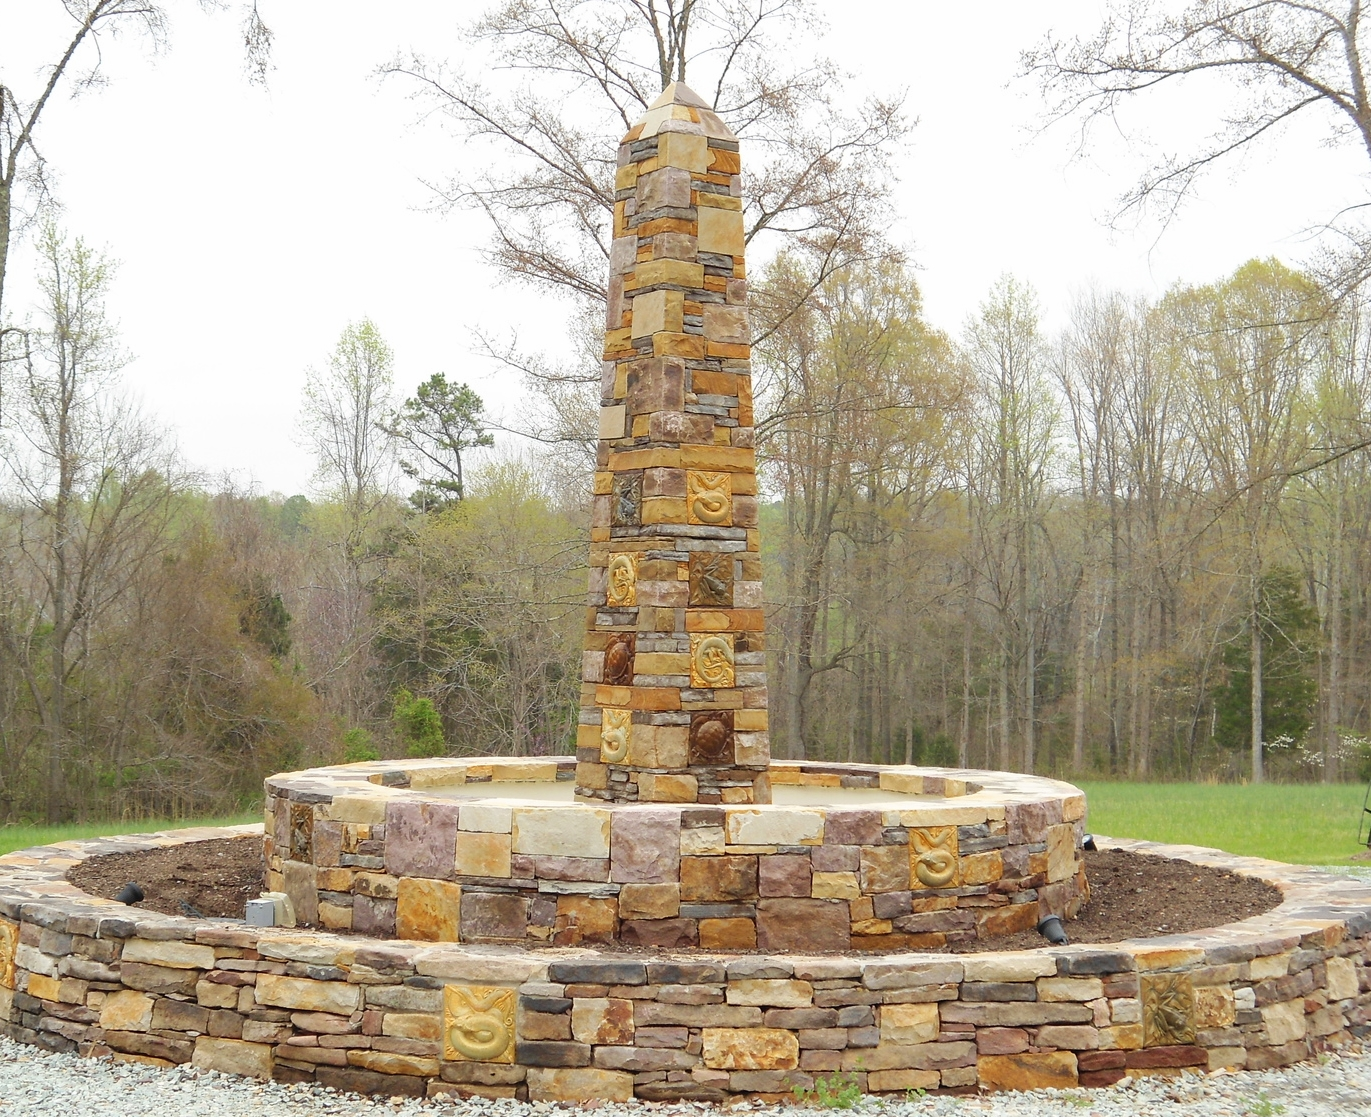 Blended building stone obelisk with tile accents